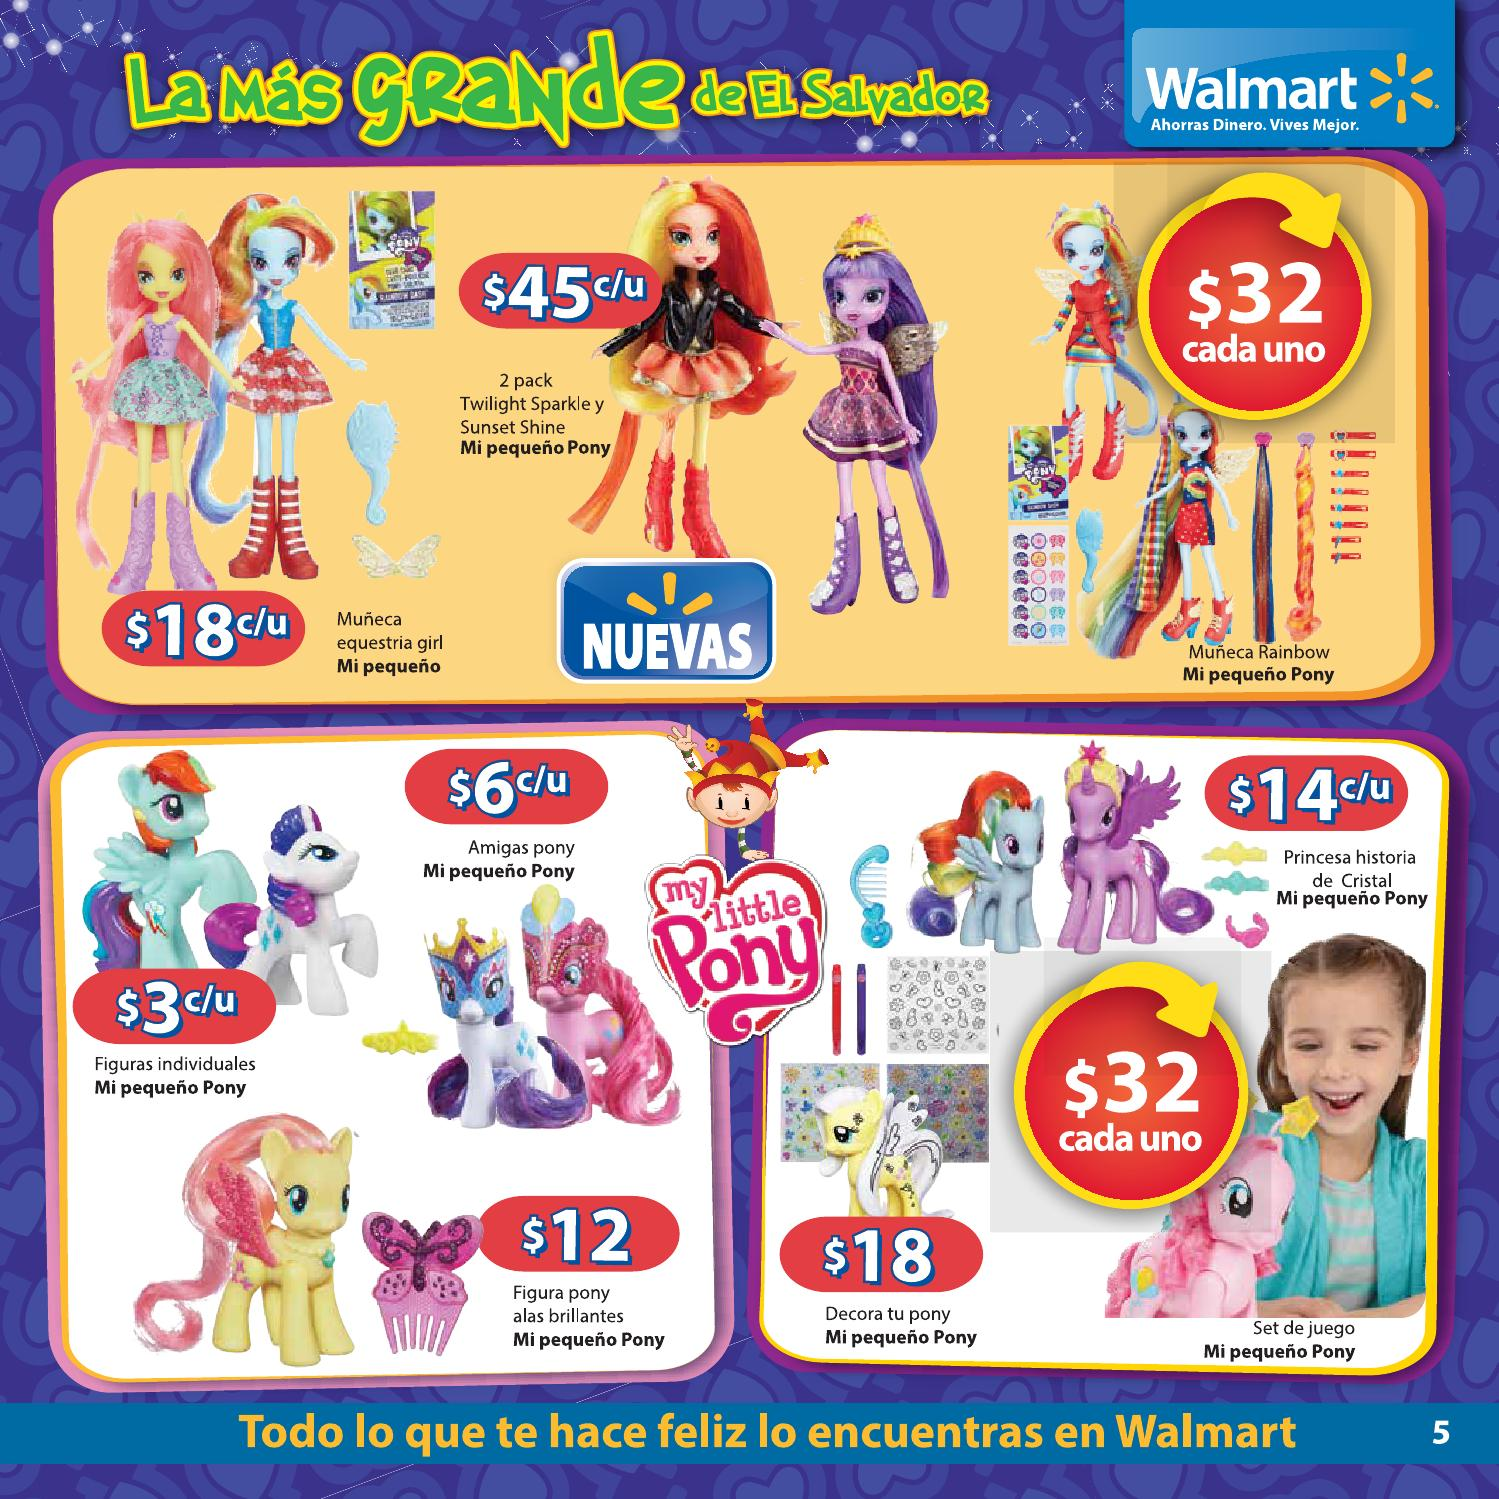 Walmart 2013 Ahora Nov 5 Ofertas Page Juguetes Guia De Compras hroBdCtsQx